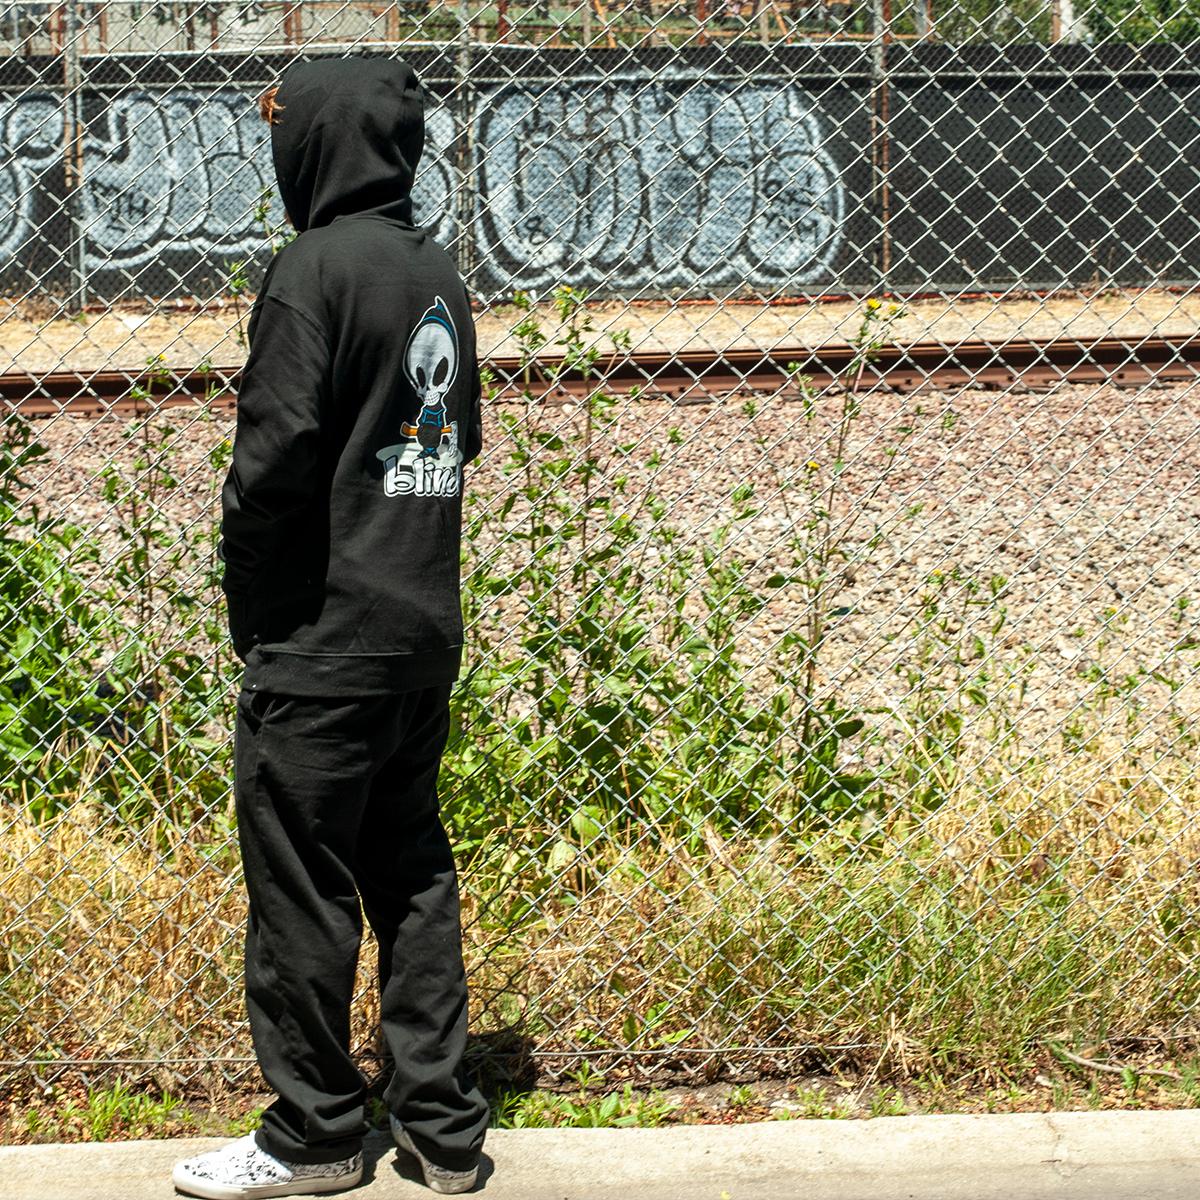 Blind Skateboards OG reaper apparel jordan maxham hoody sweatshirt blk